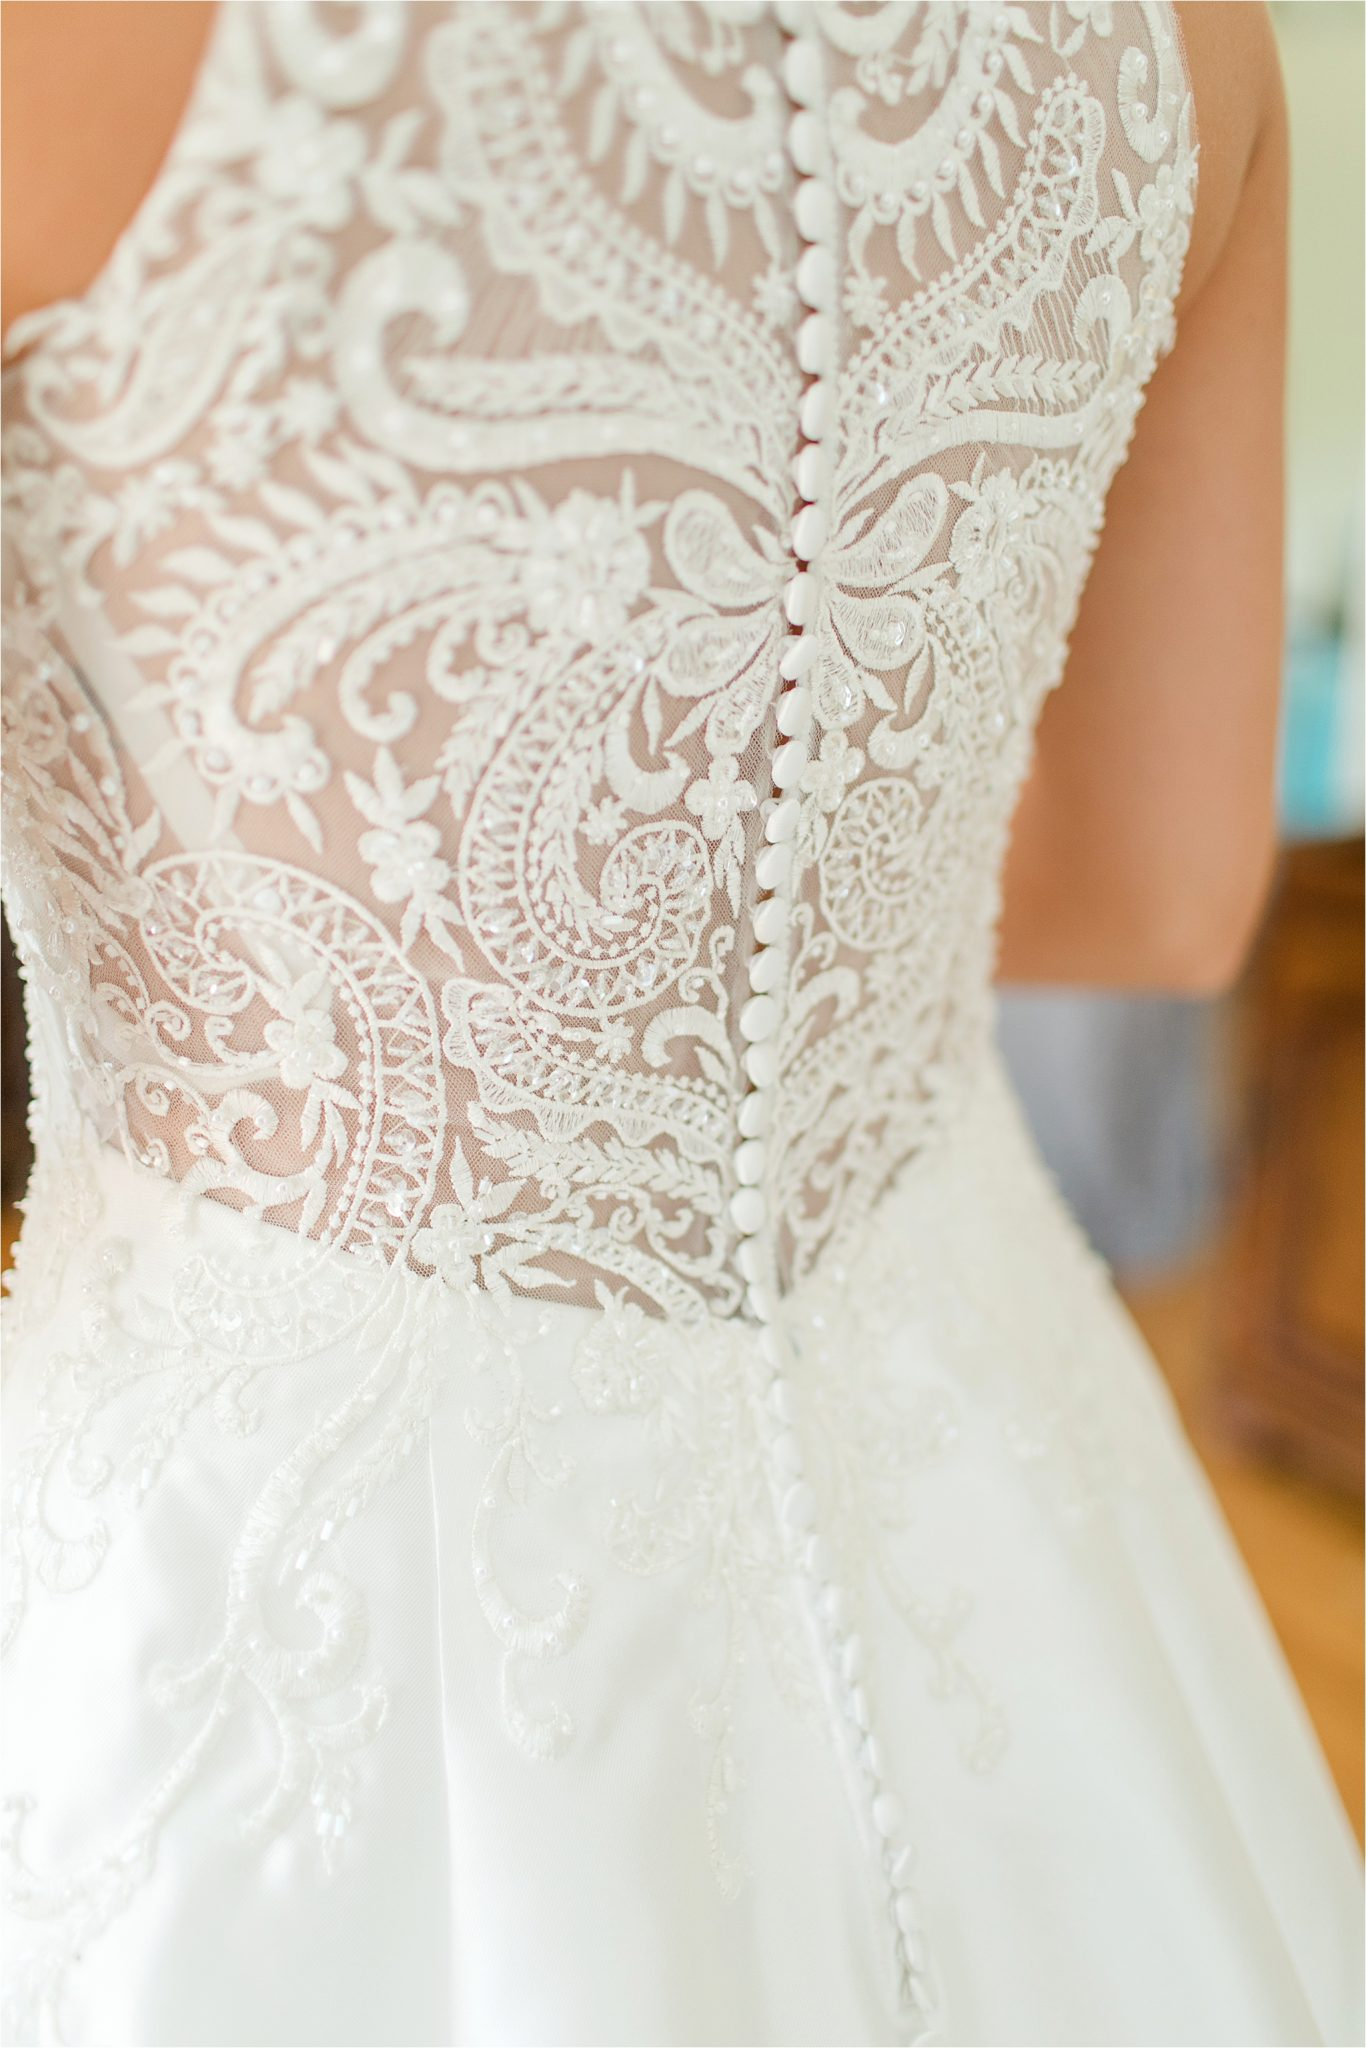 Sonnet House, Birmingham Alabama Wedding Photographer, Wedding dress details